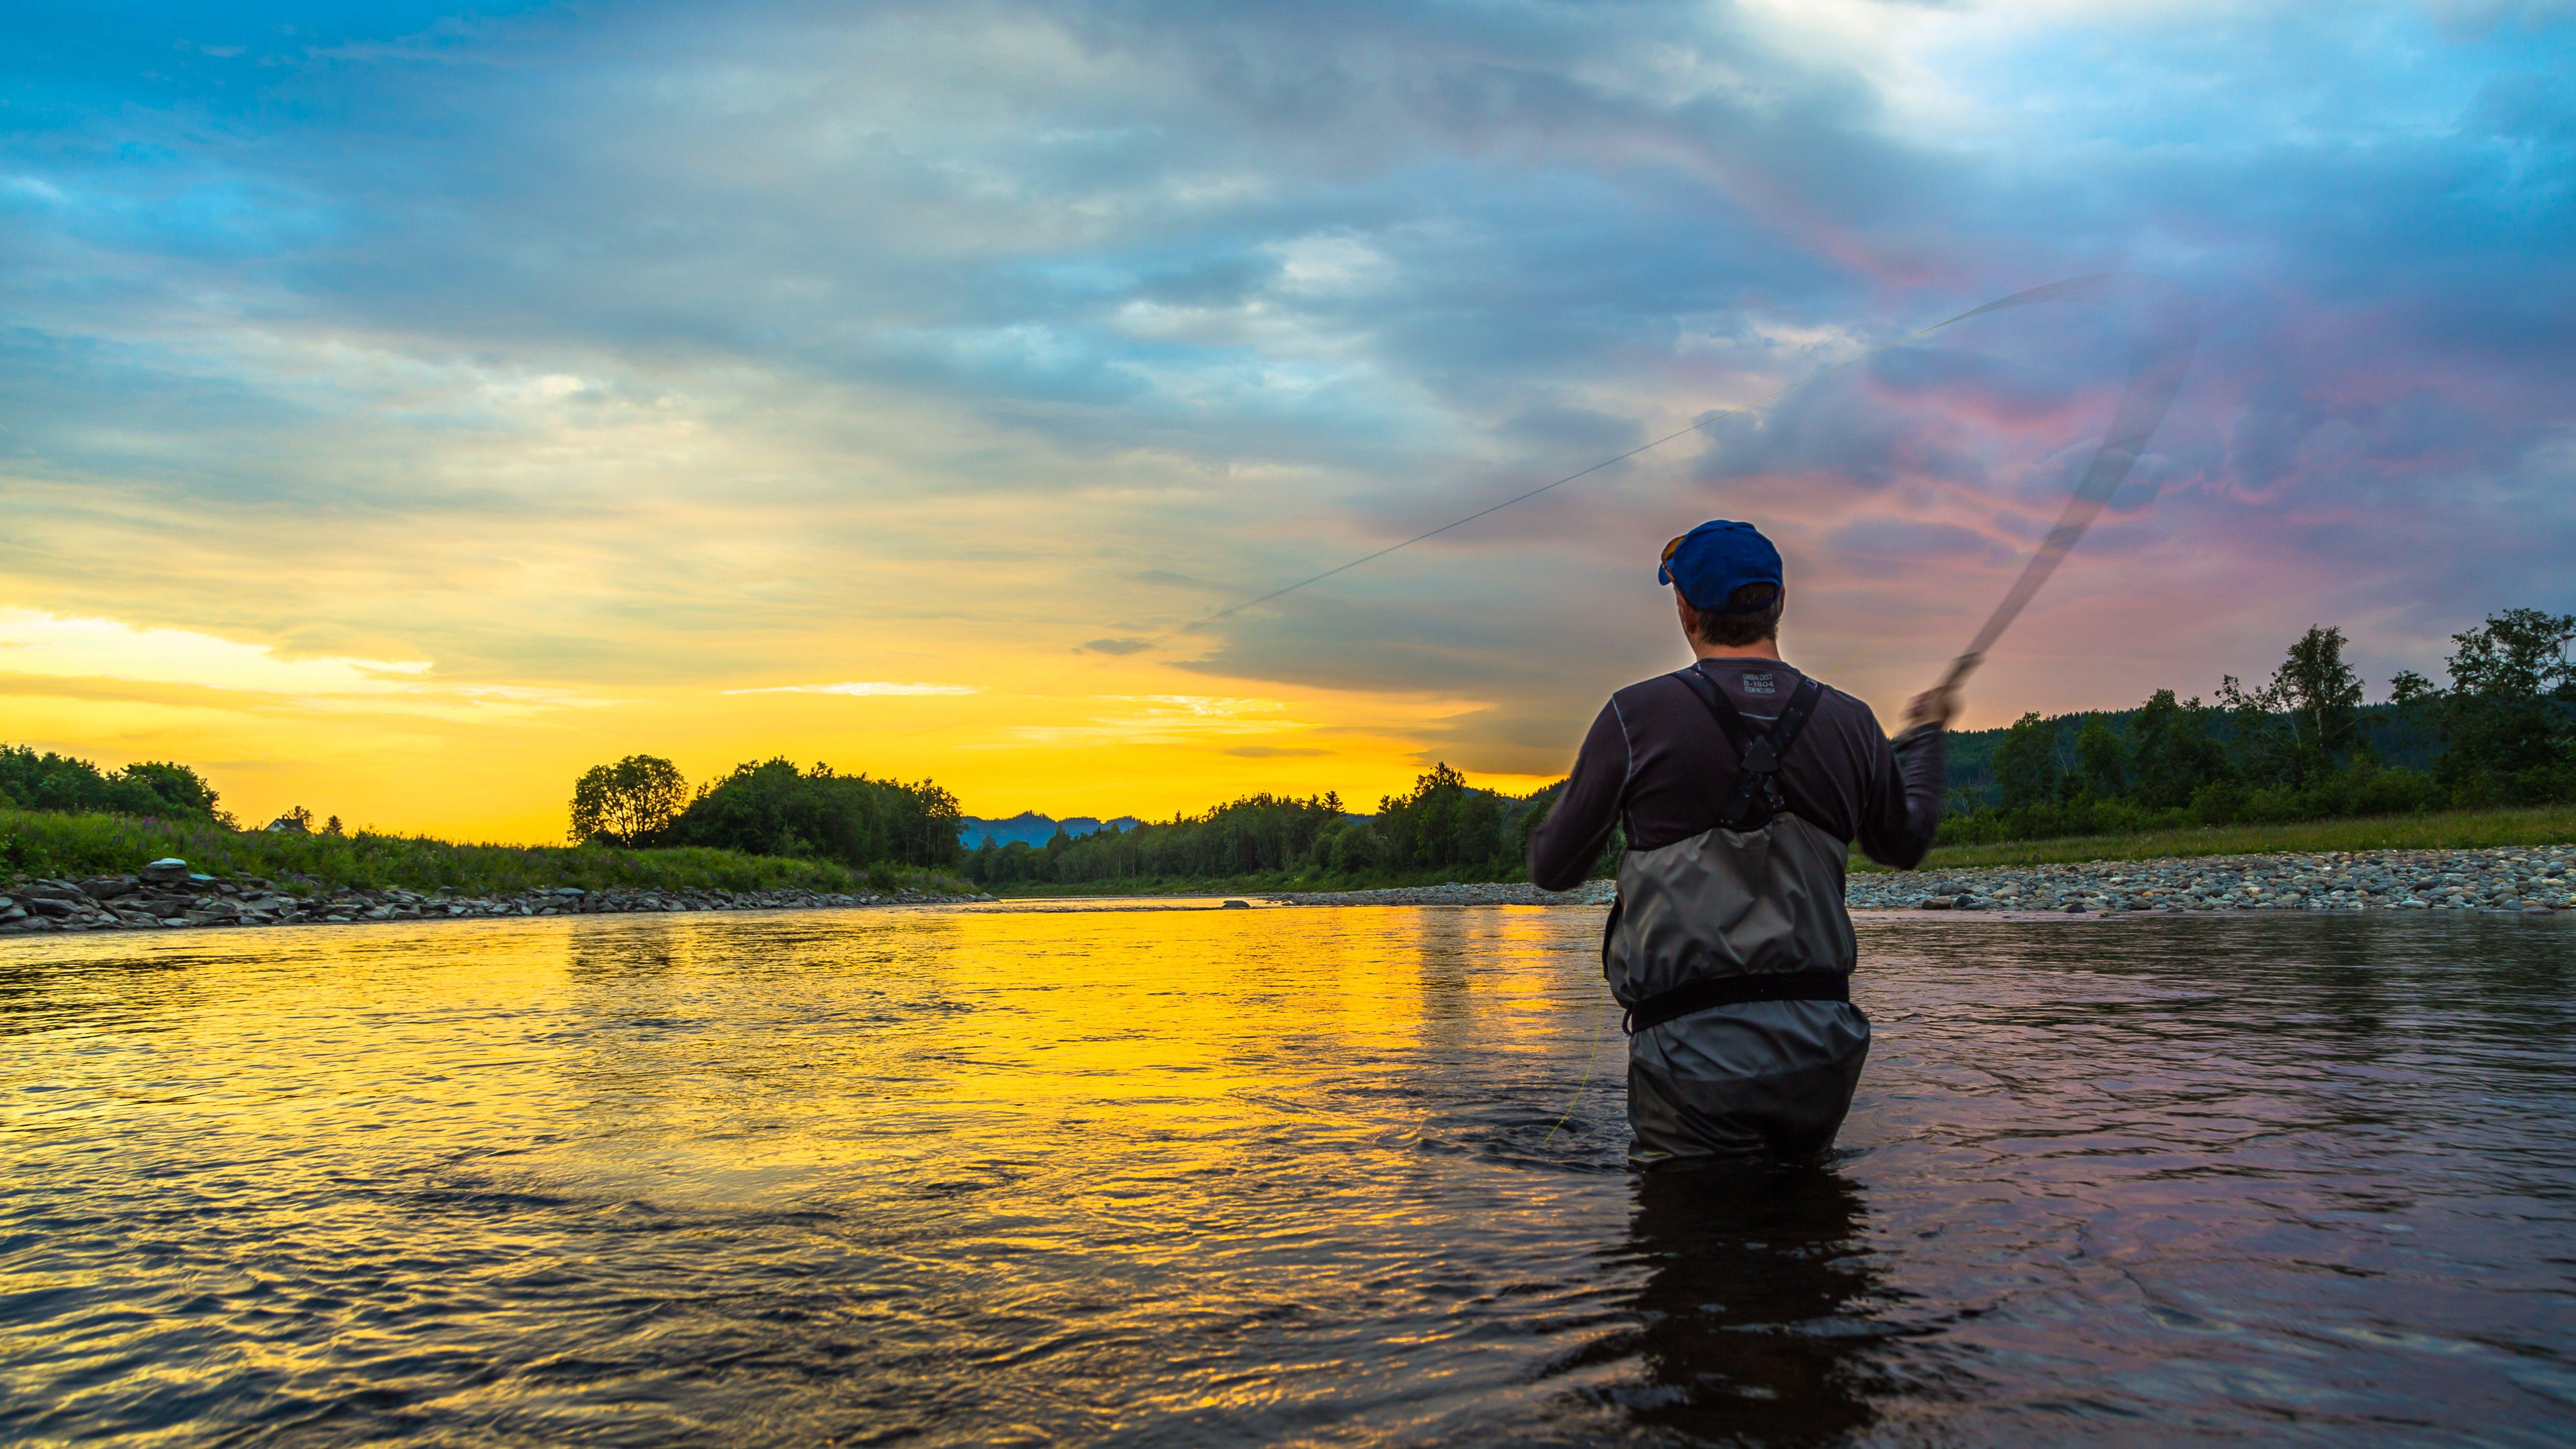 Salmon fishing in the river Stjørdalselva in Norway